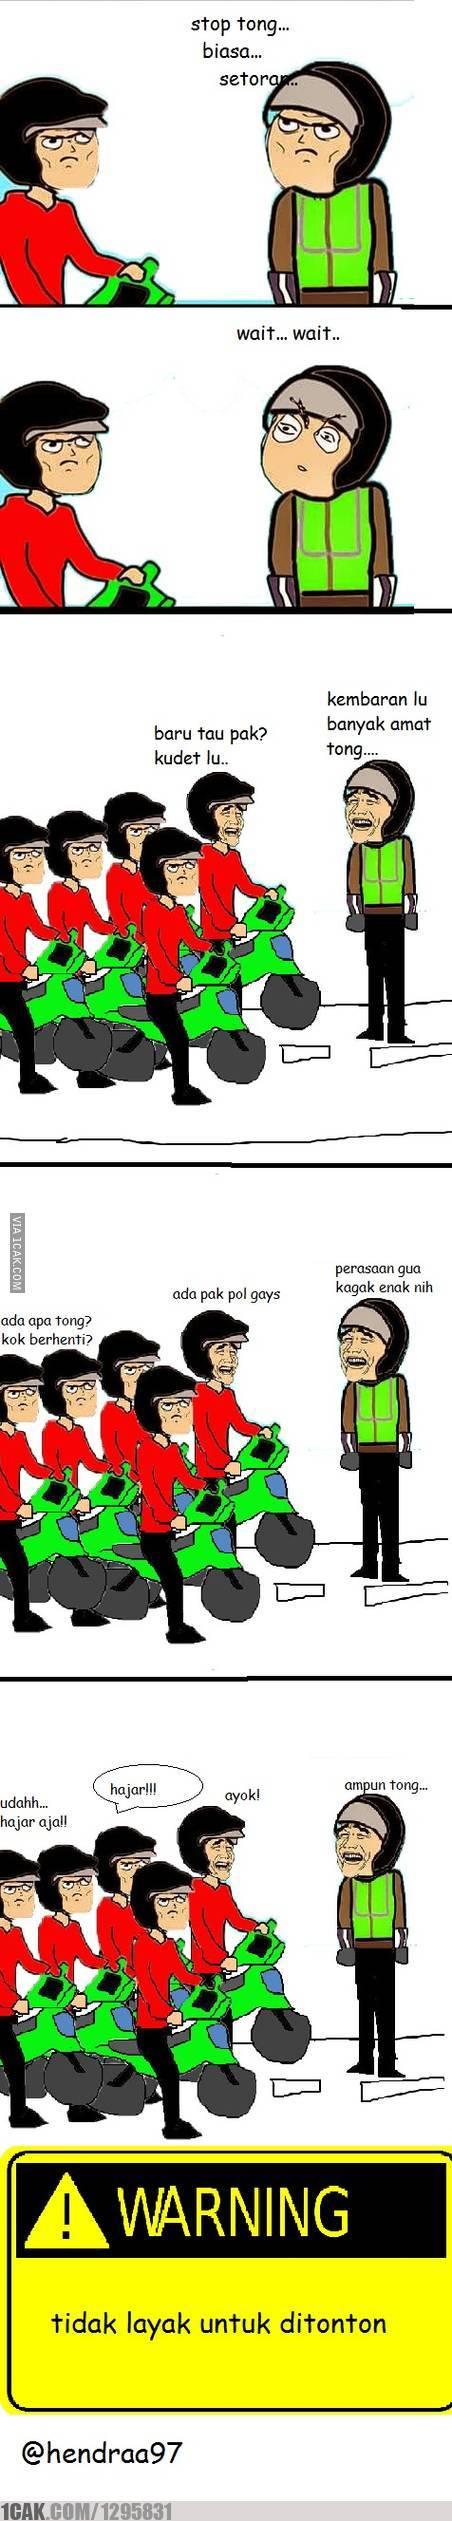 Otong Pakpol Meme Indonesia Lucu V V Pinterest